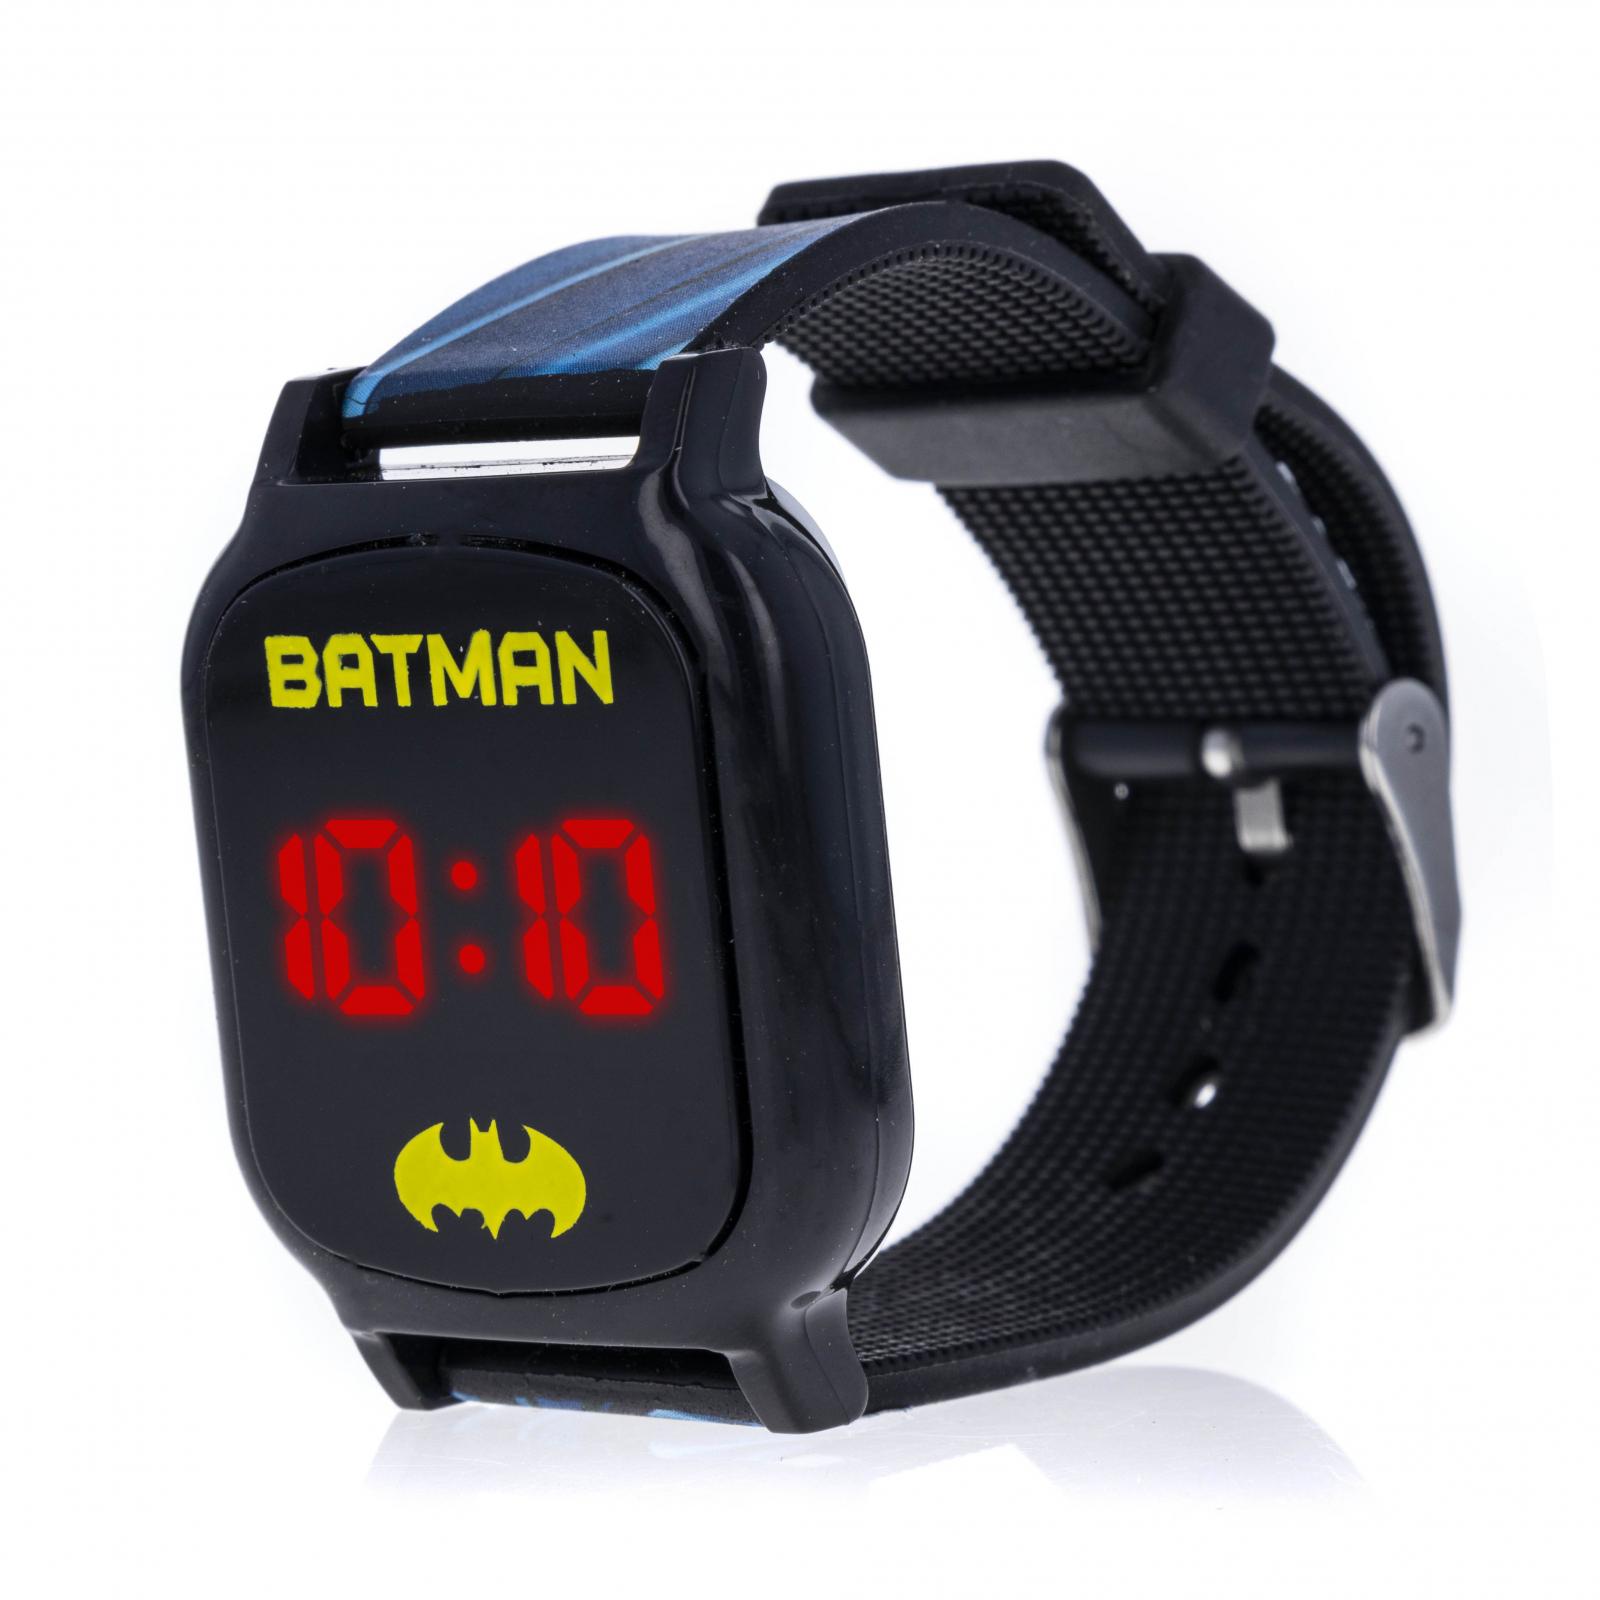 Licensed Batman LED Display Digital Touch Screen Watch